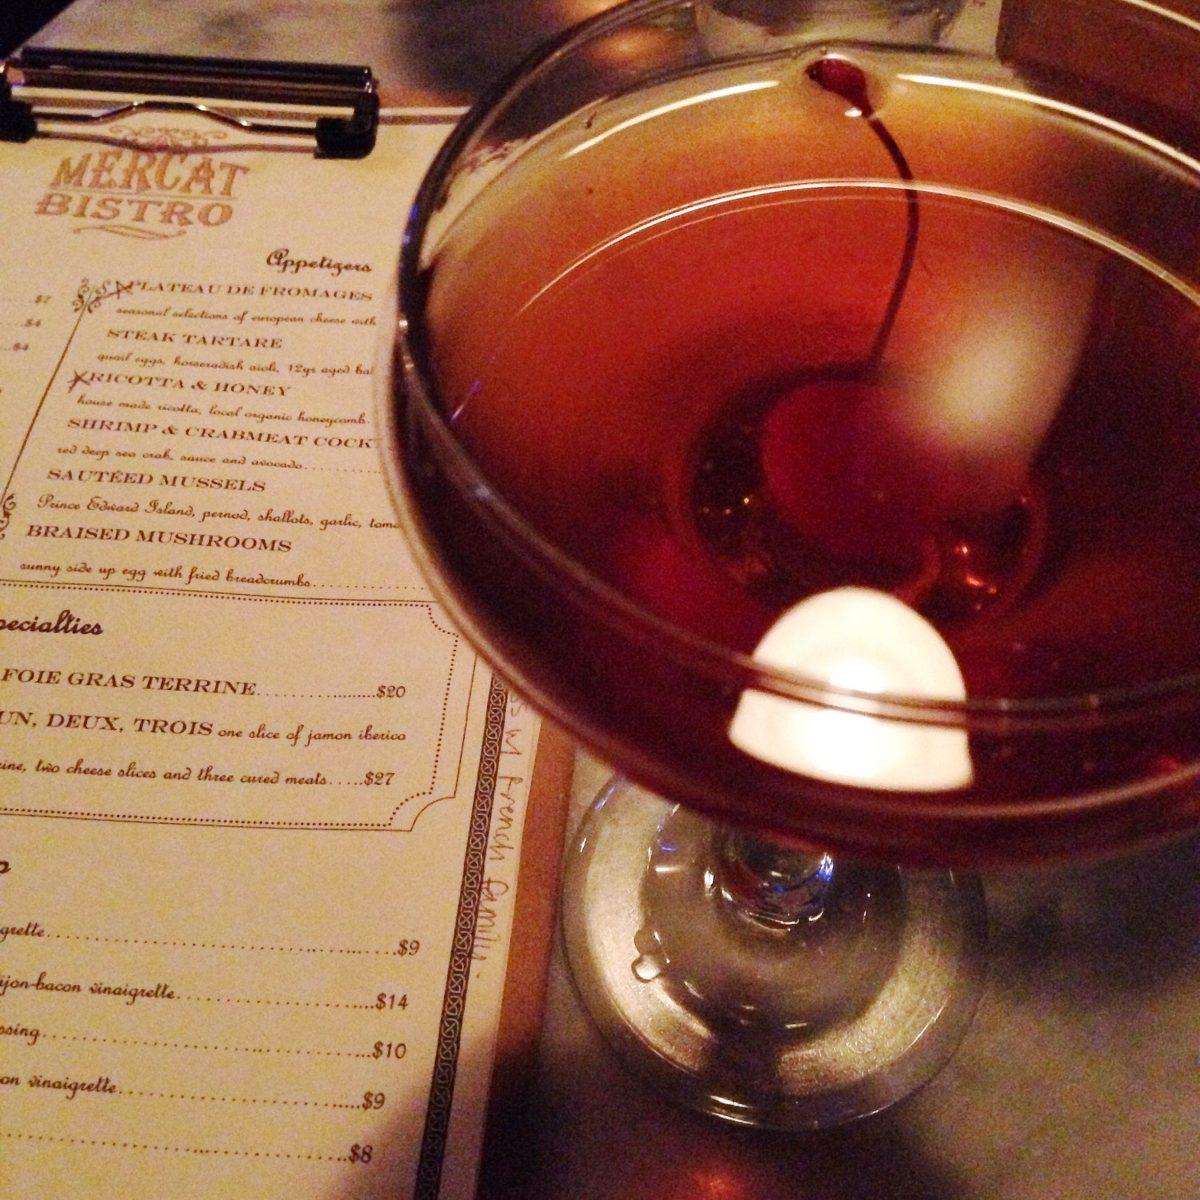 Manhattan cocktail (Texas whiskey, vermouth, bitters)